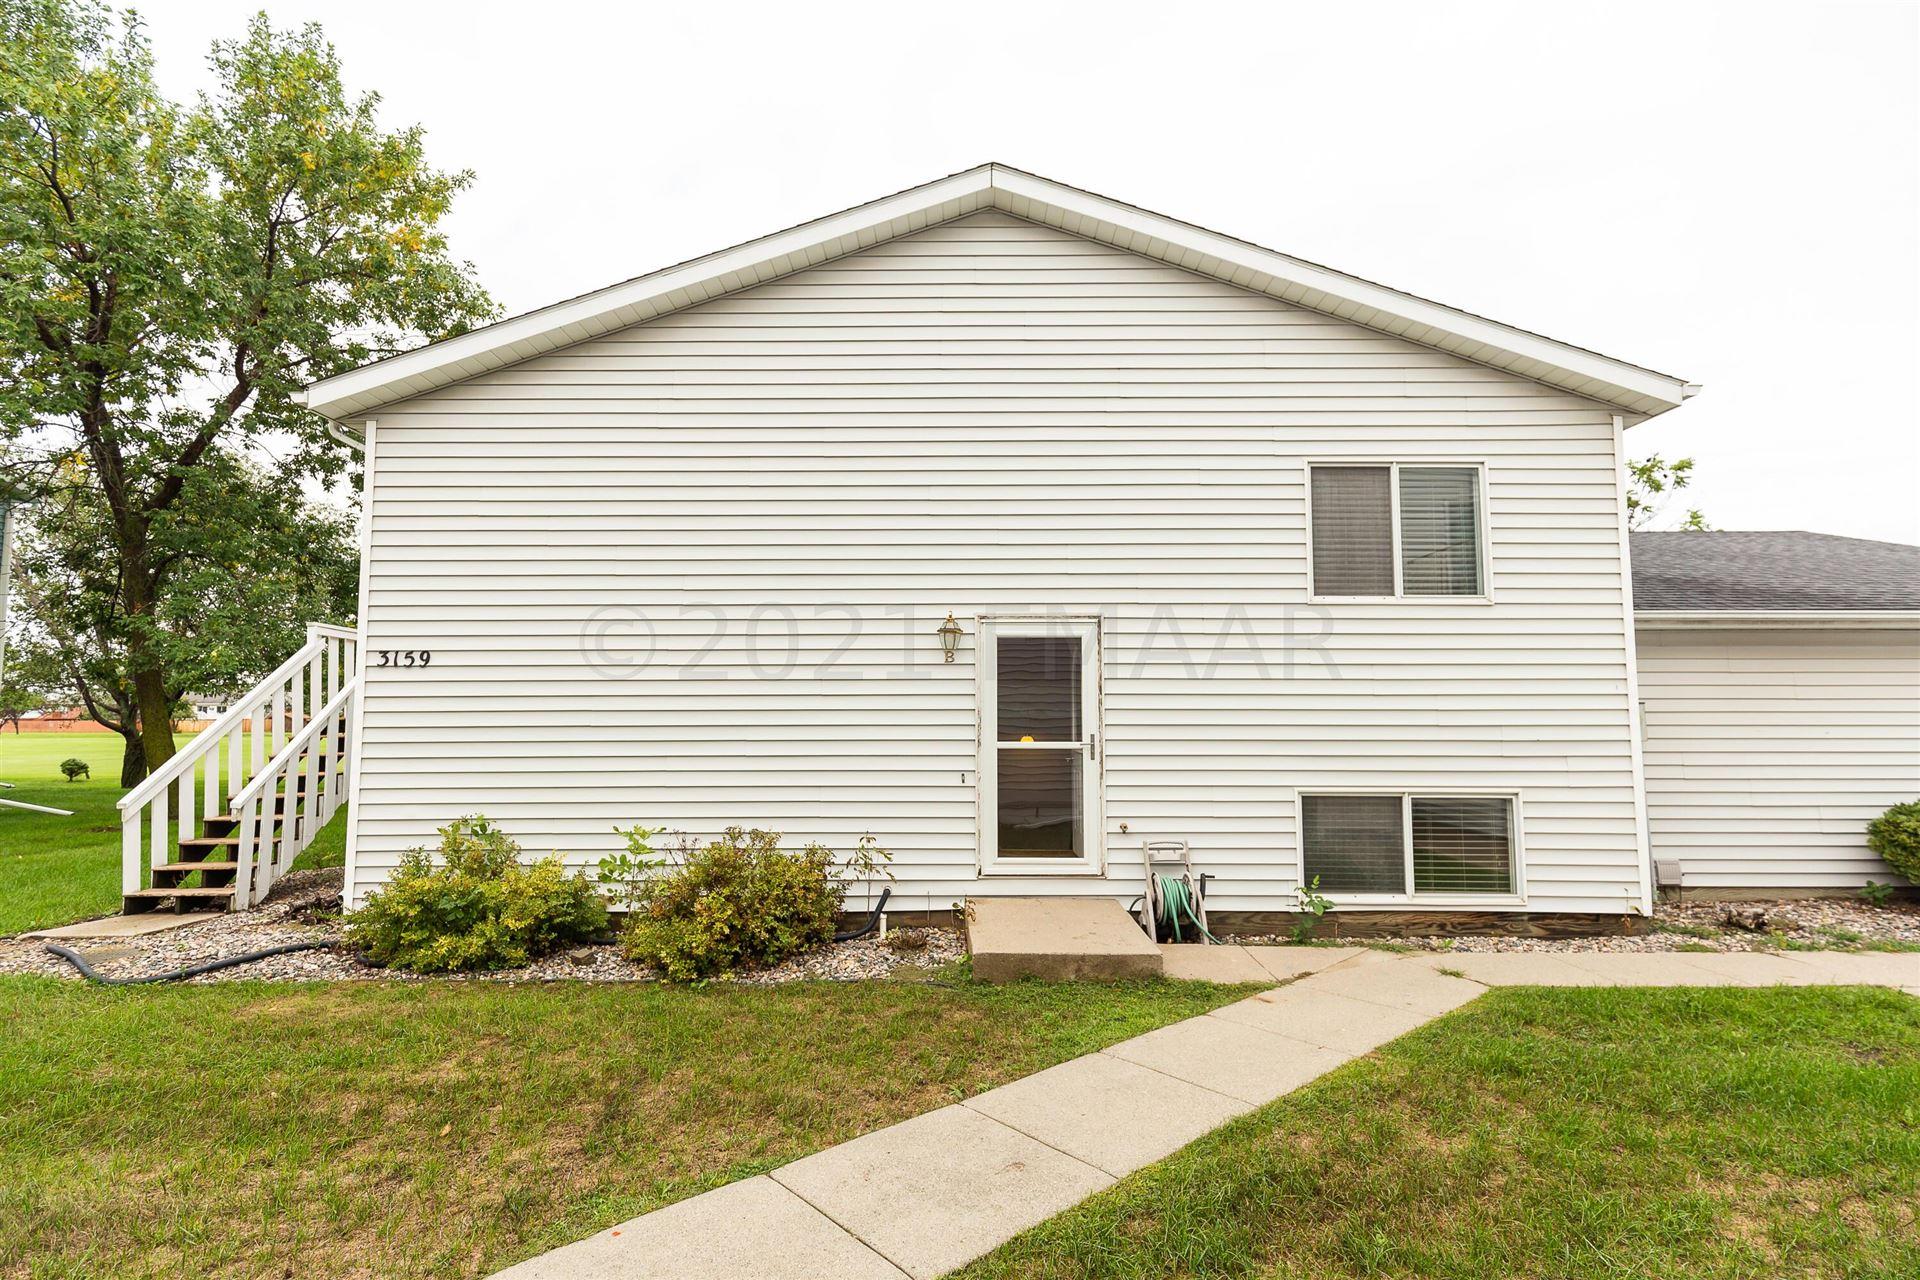 3159 17 Street S #B, Fargo, ND 58103 - #: 21-4961